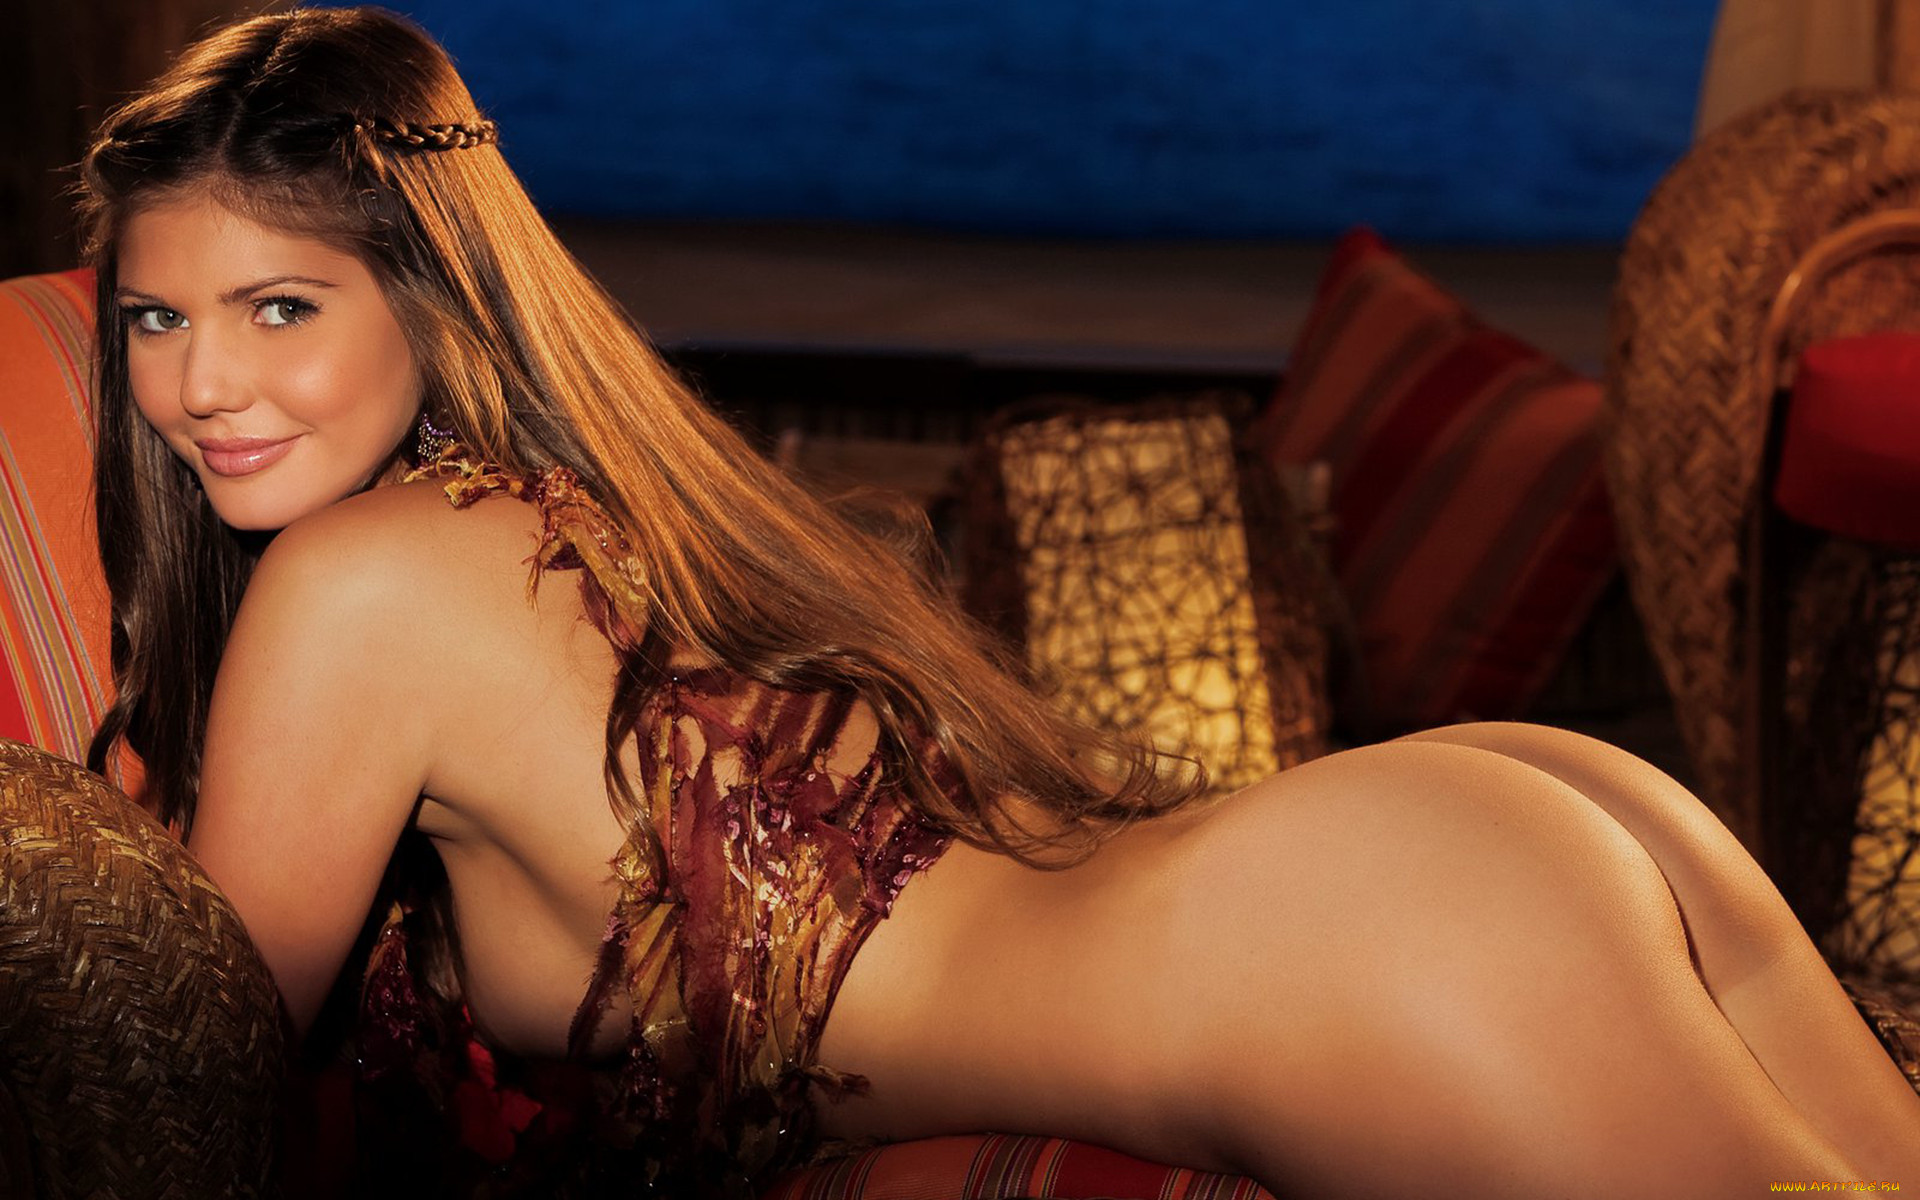 Playboy Брюнетки, Шатенки взгляд, попка, тело, шатенка.